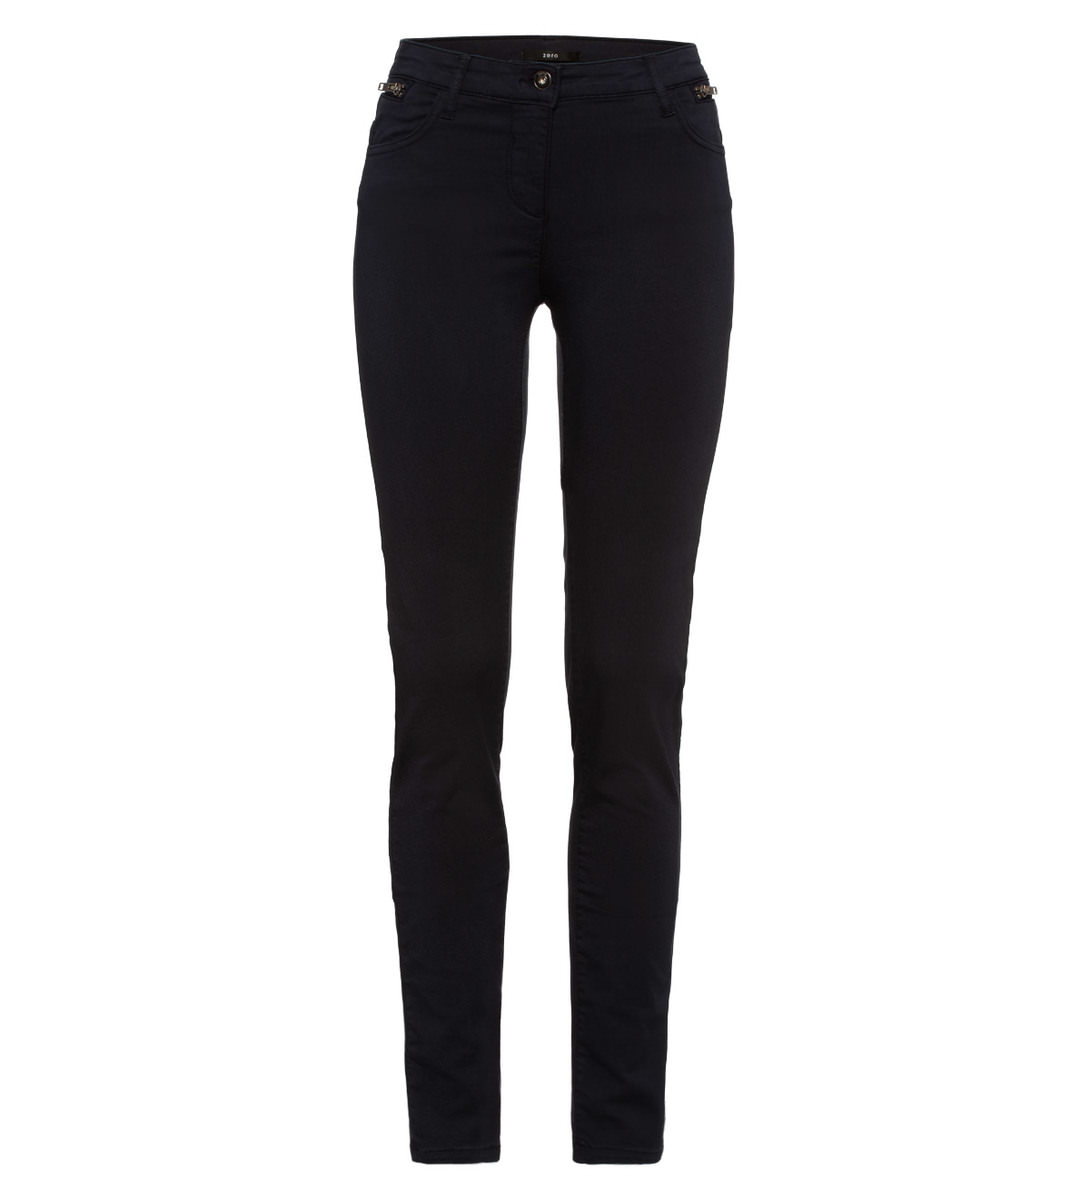 Hose im unifarbenen Design 32 Inch in blue black